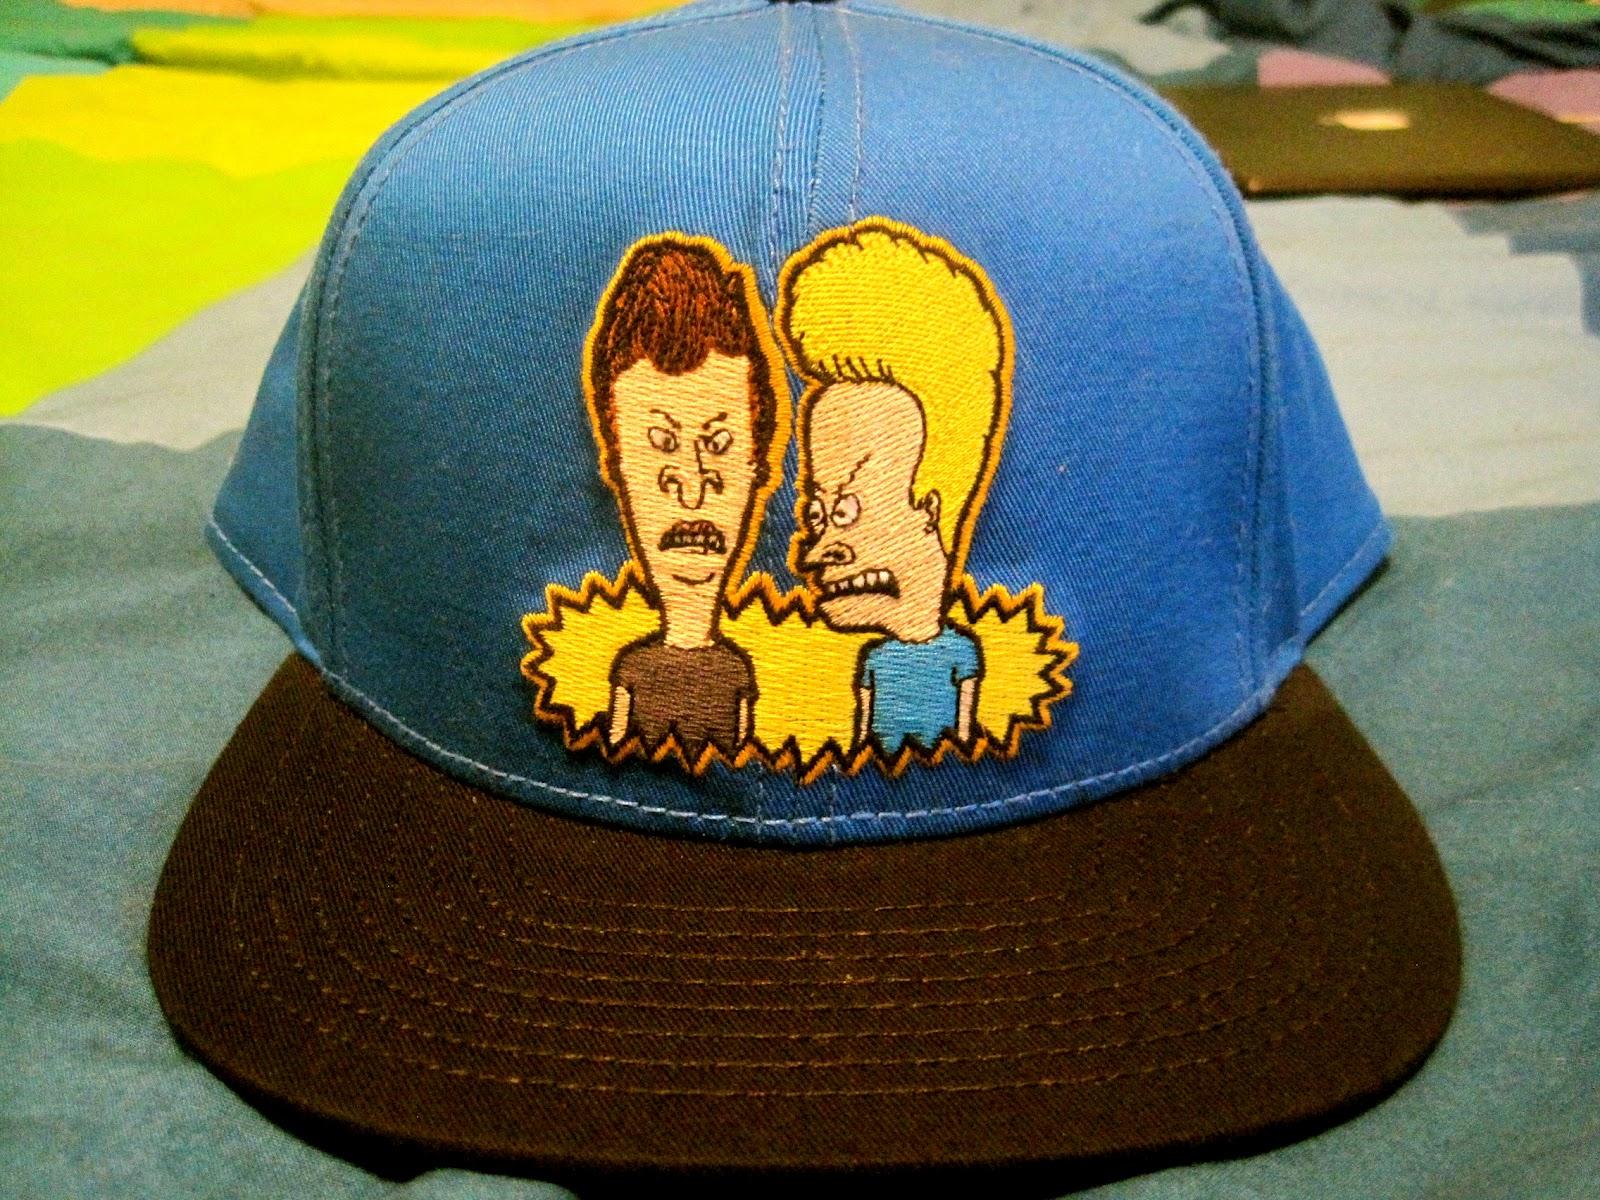 98405ec8ede DON D WORLD  Beavis and Butthead MTV Snapback hat